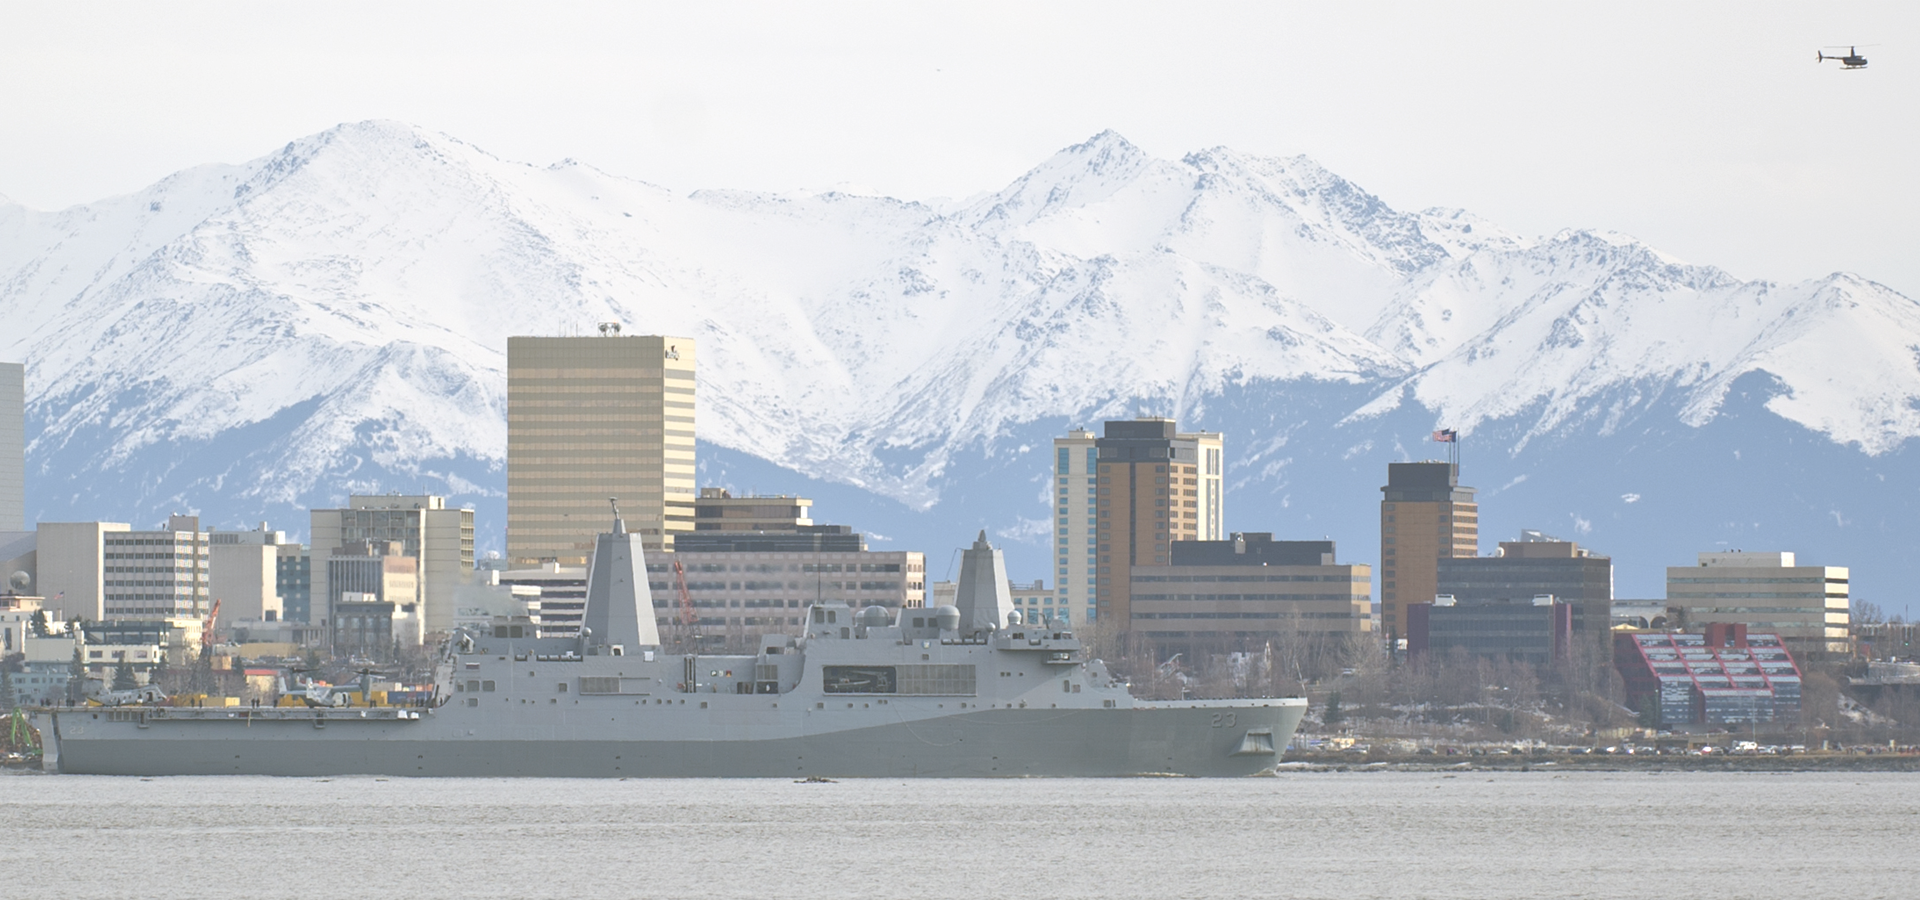 Peer-to-peer advisory in Anchorage, Alaska, USA